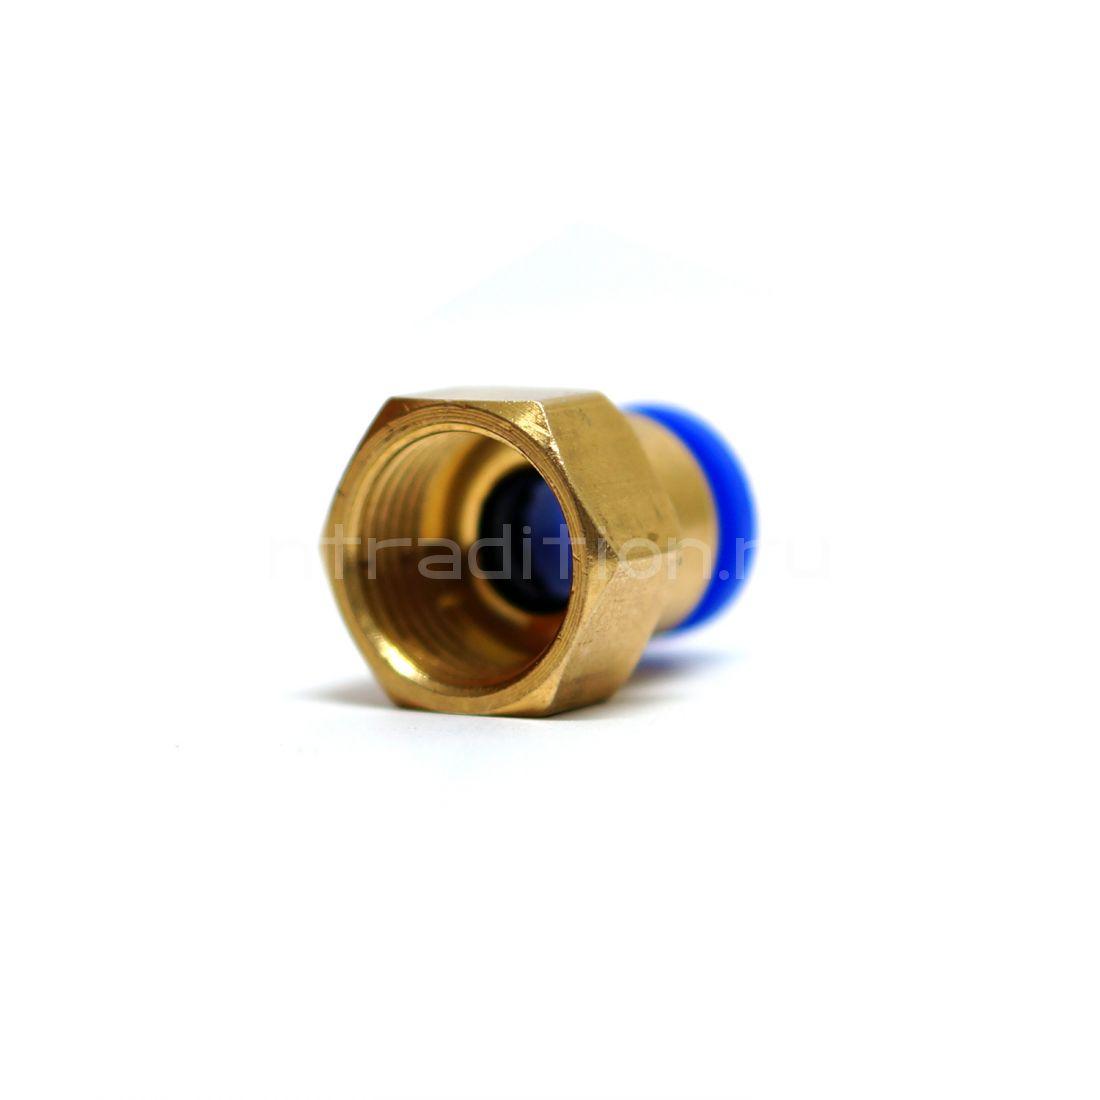 Штуцер-быстросъем 1/2 на 10 мм внутренняя резьба